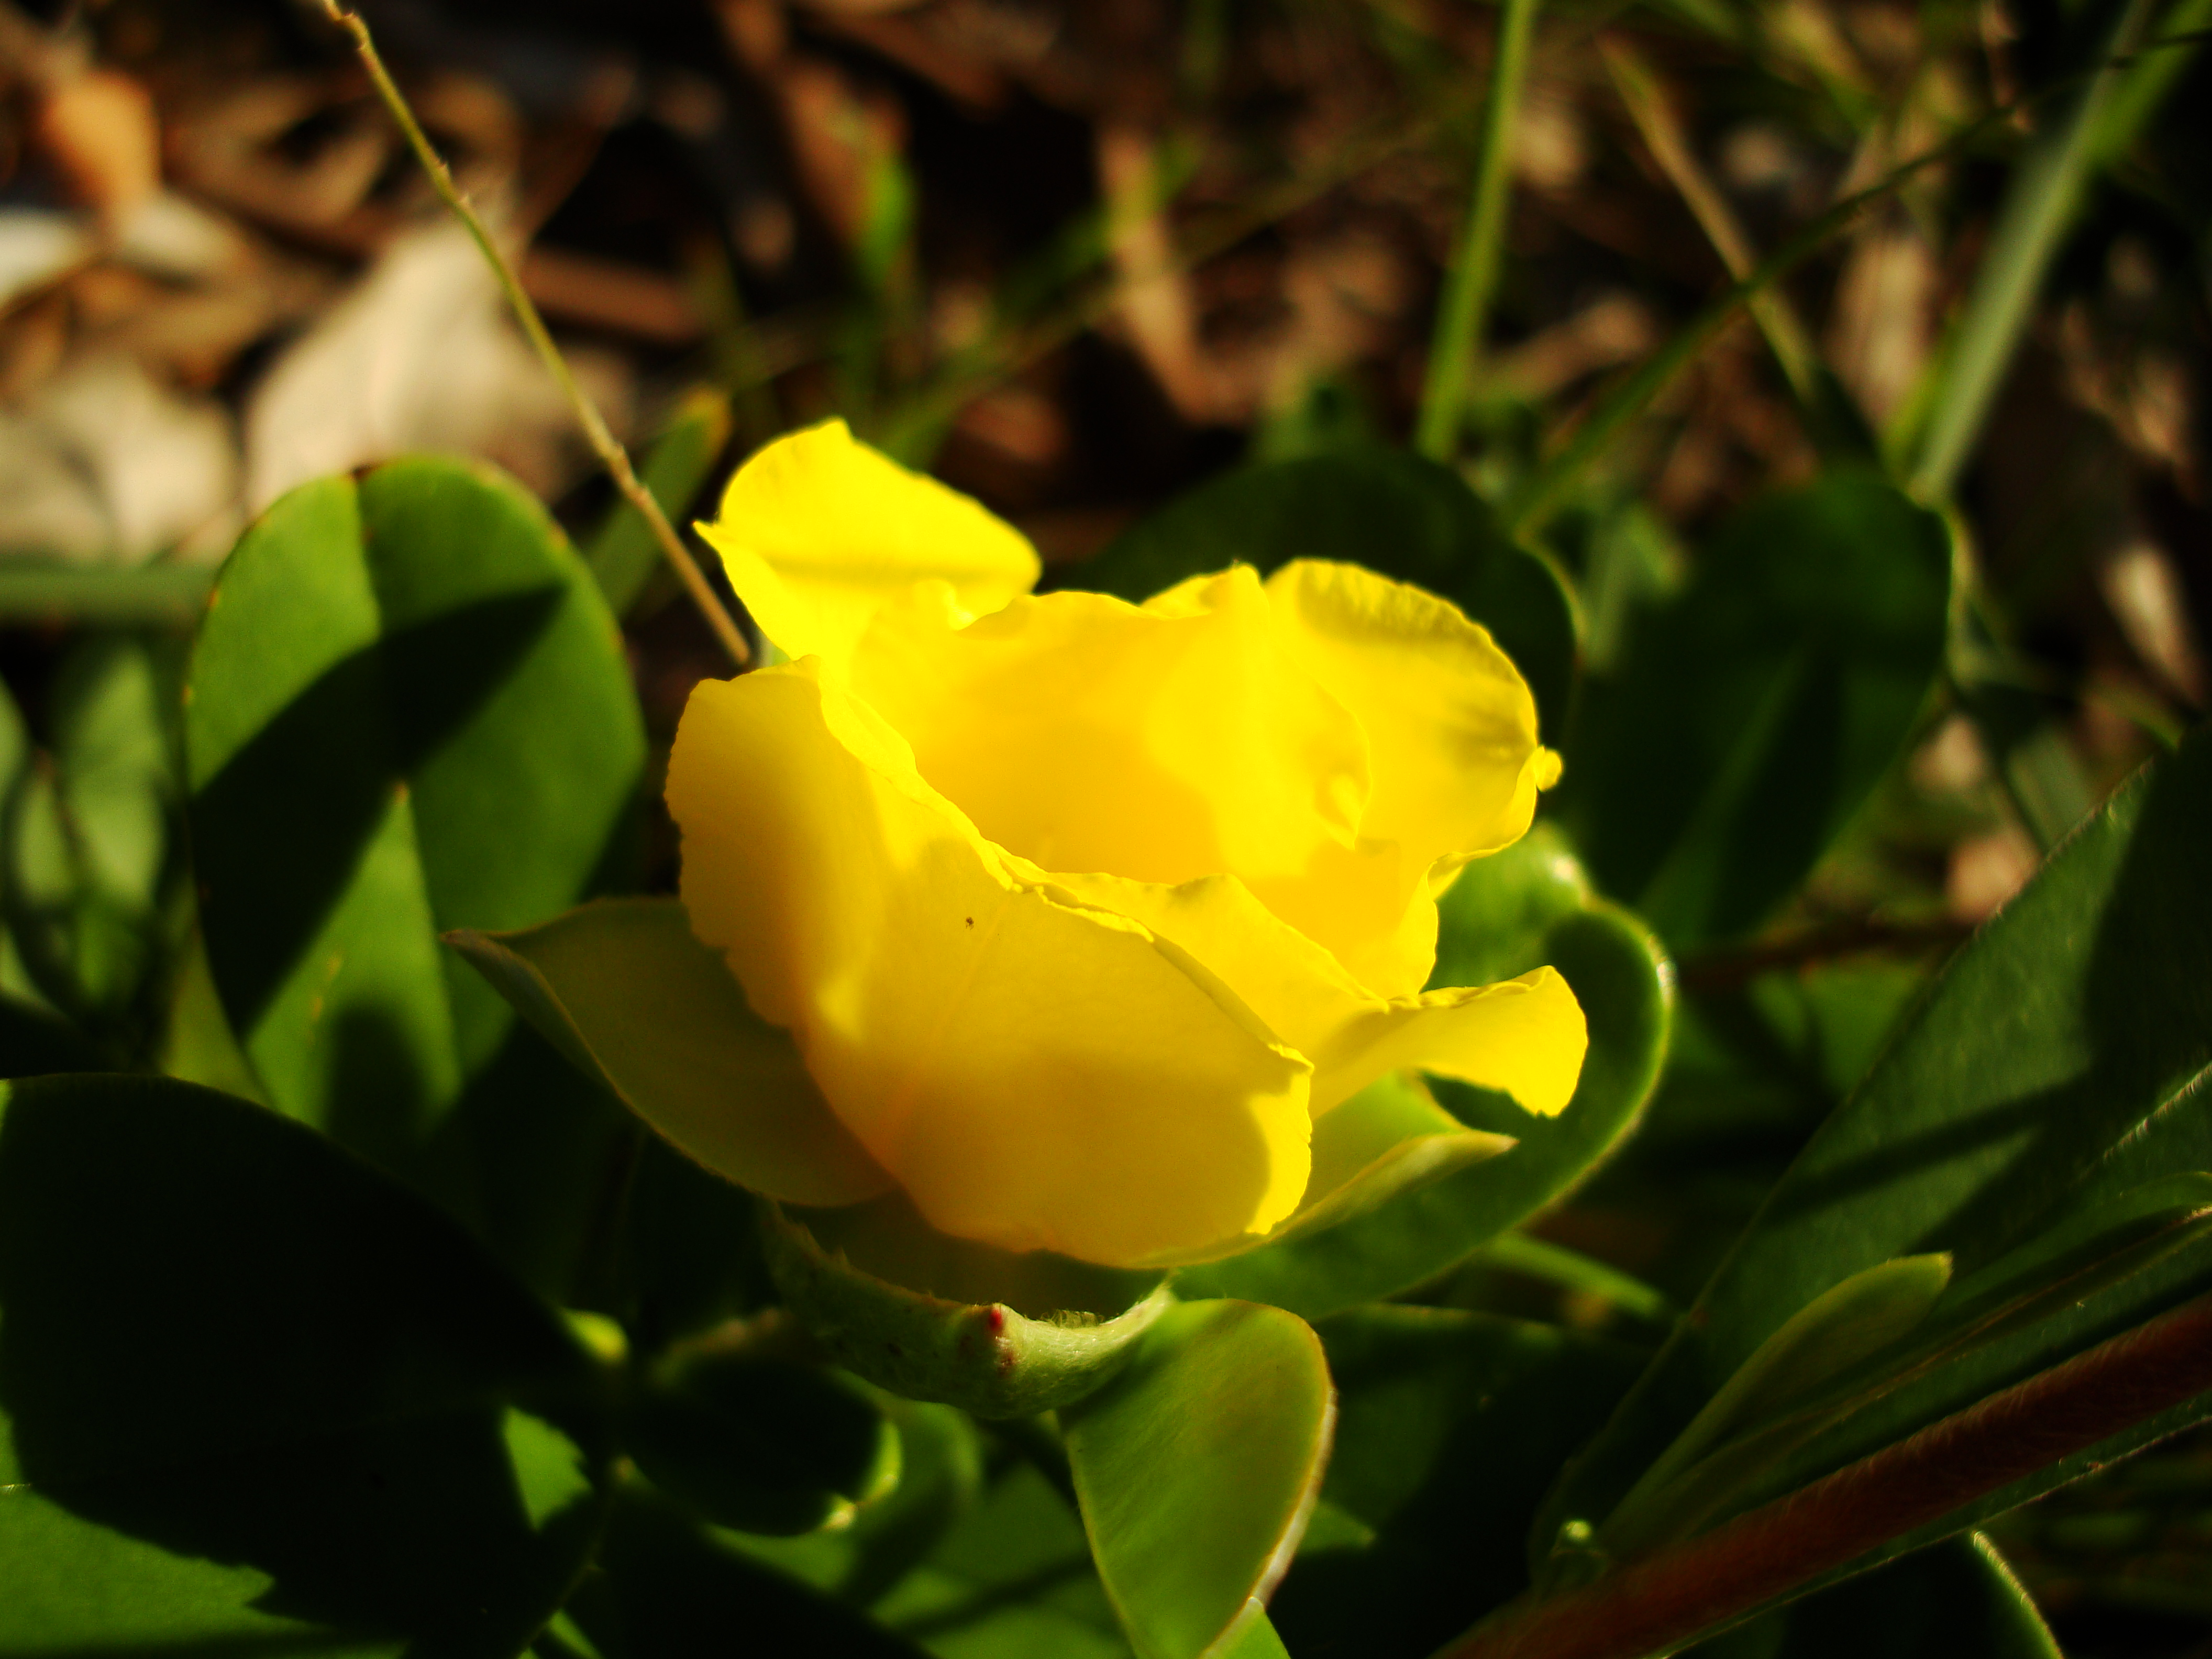 Tiny bush flowers Noosa National Park Qld Australia 16